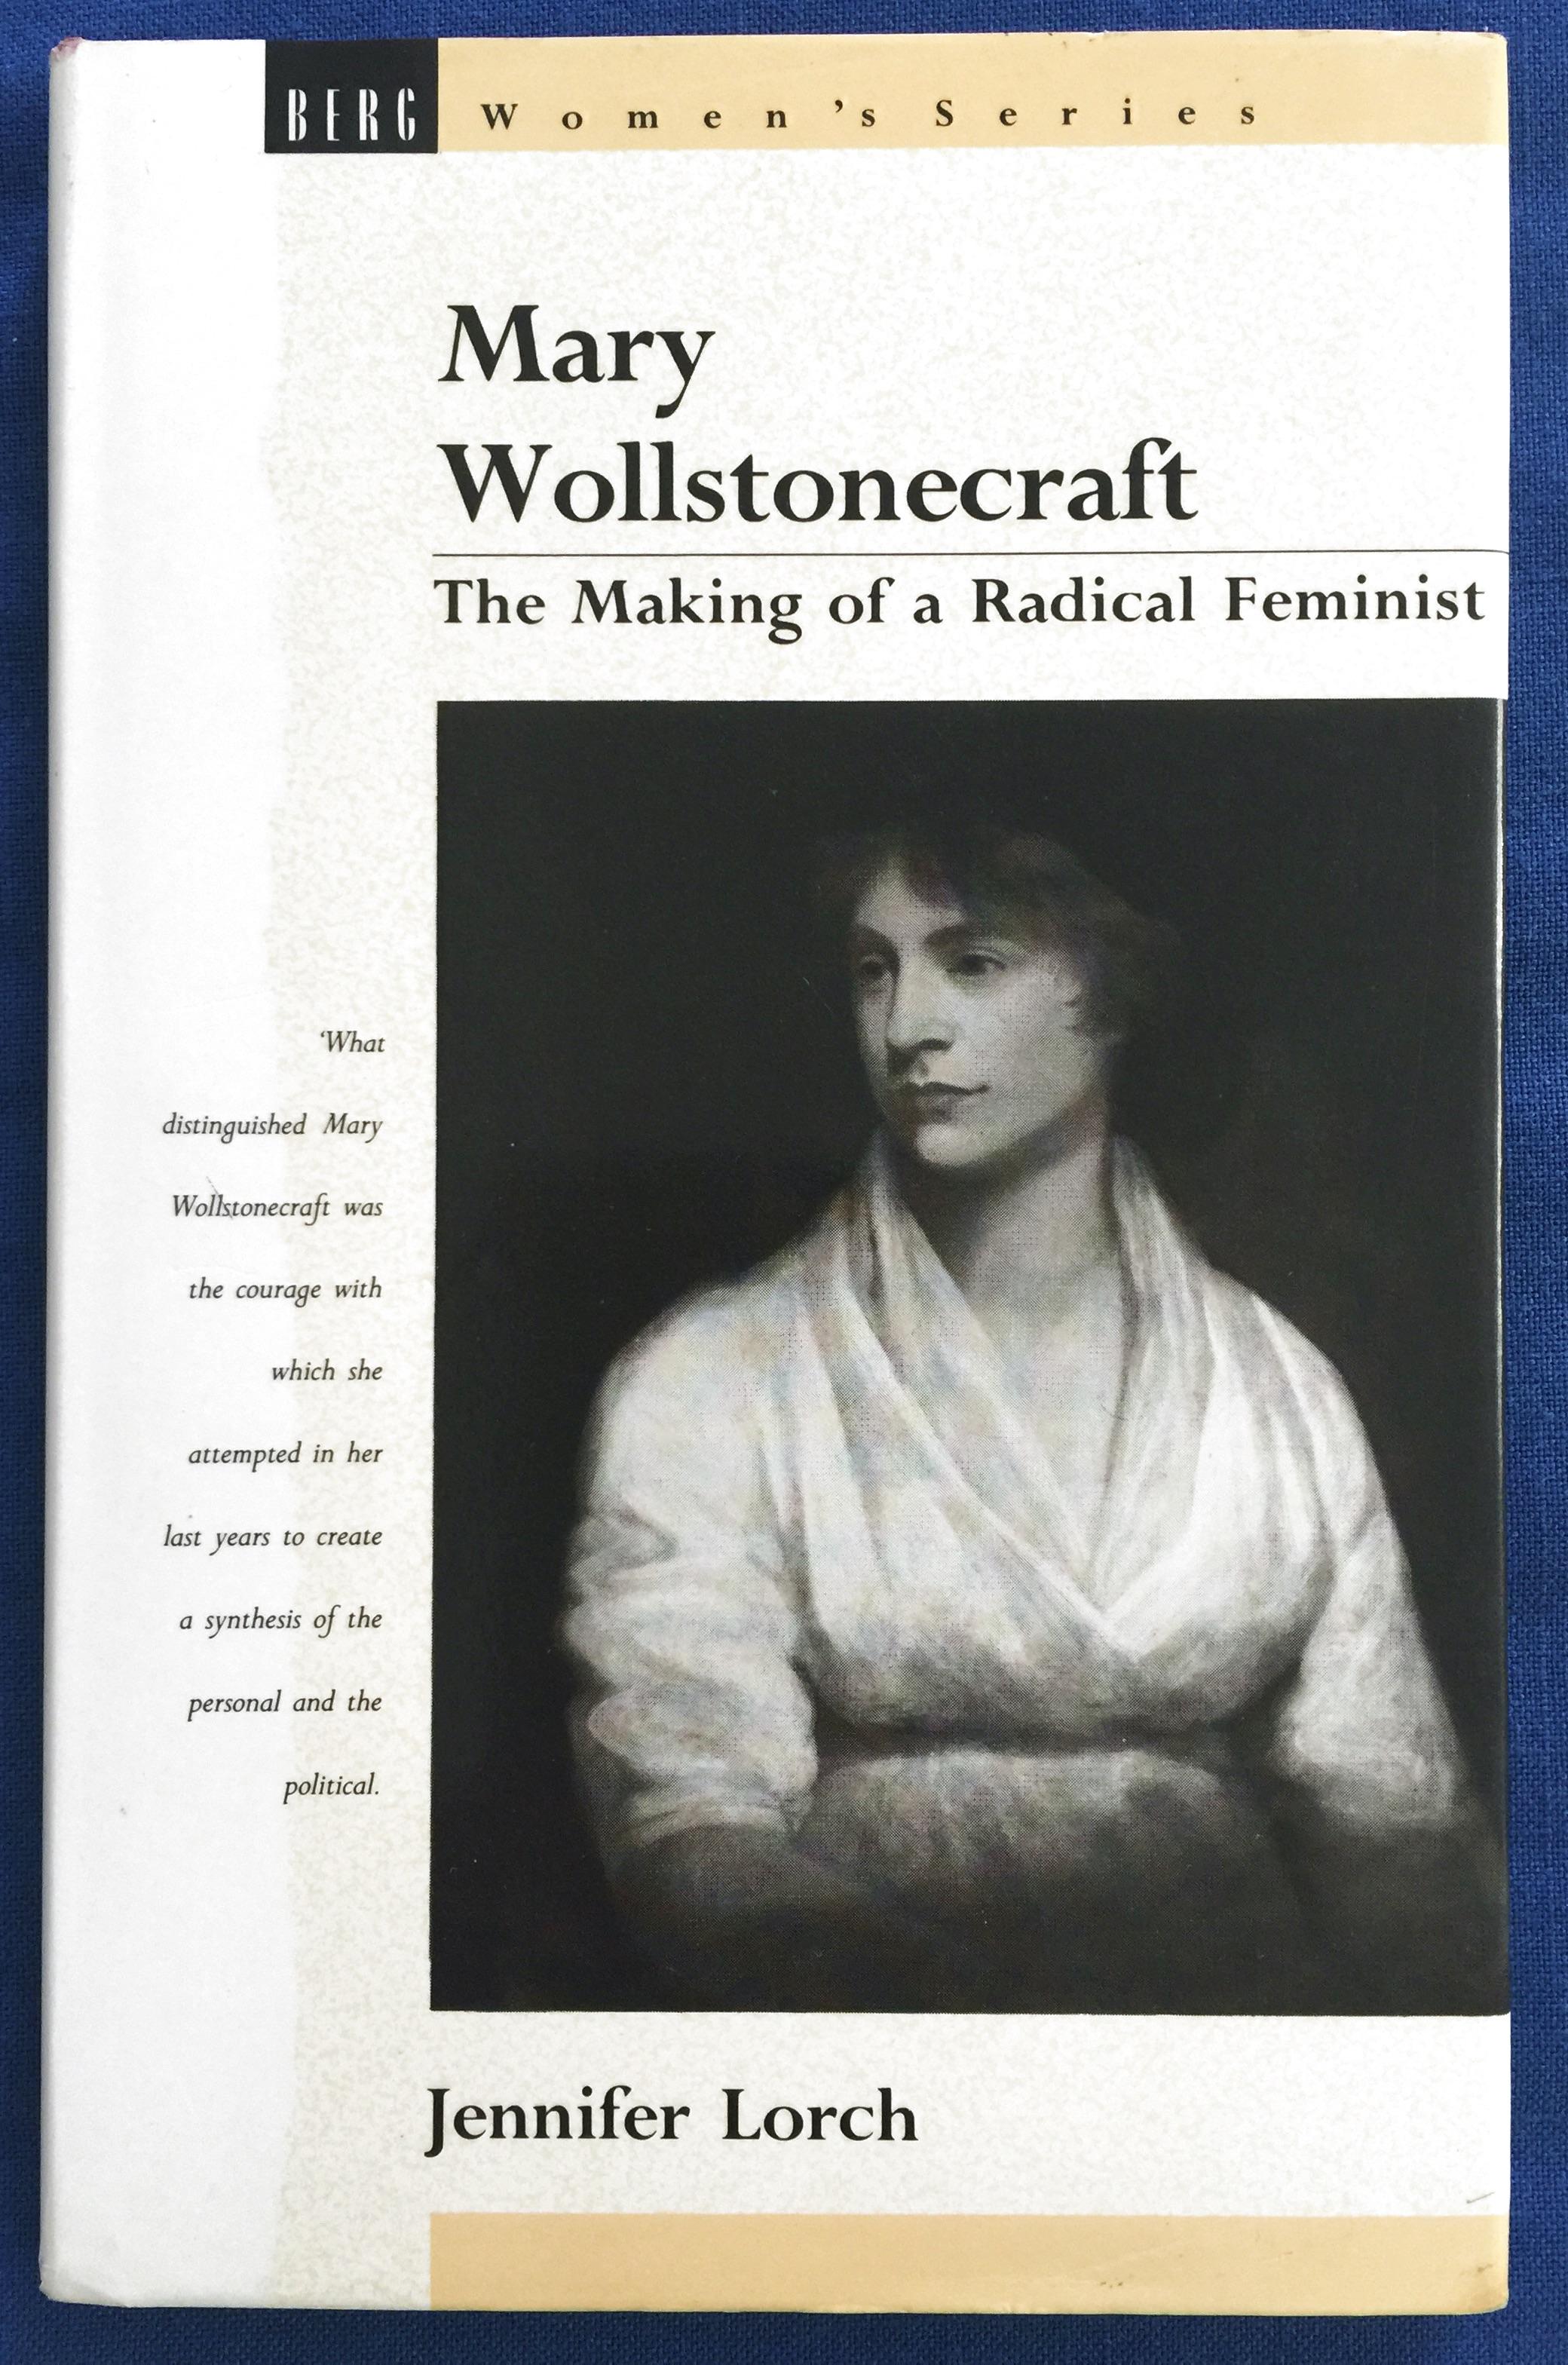 Mary Wollstonecraft: The Making of a Radical Feminist - Jennifer Lorch